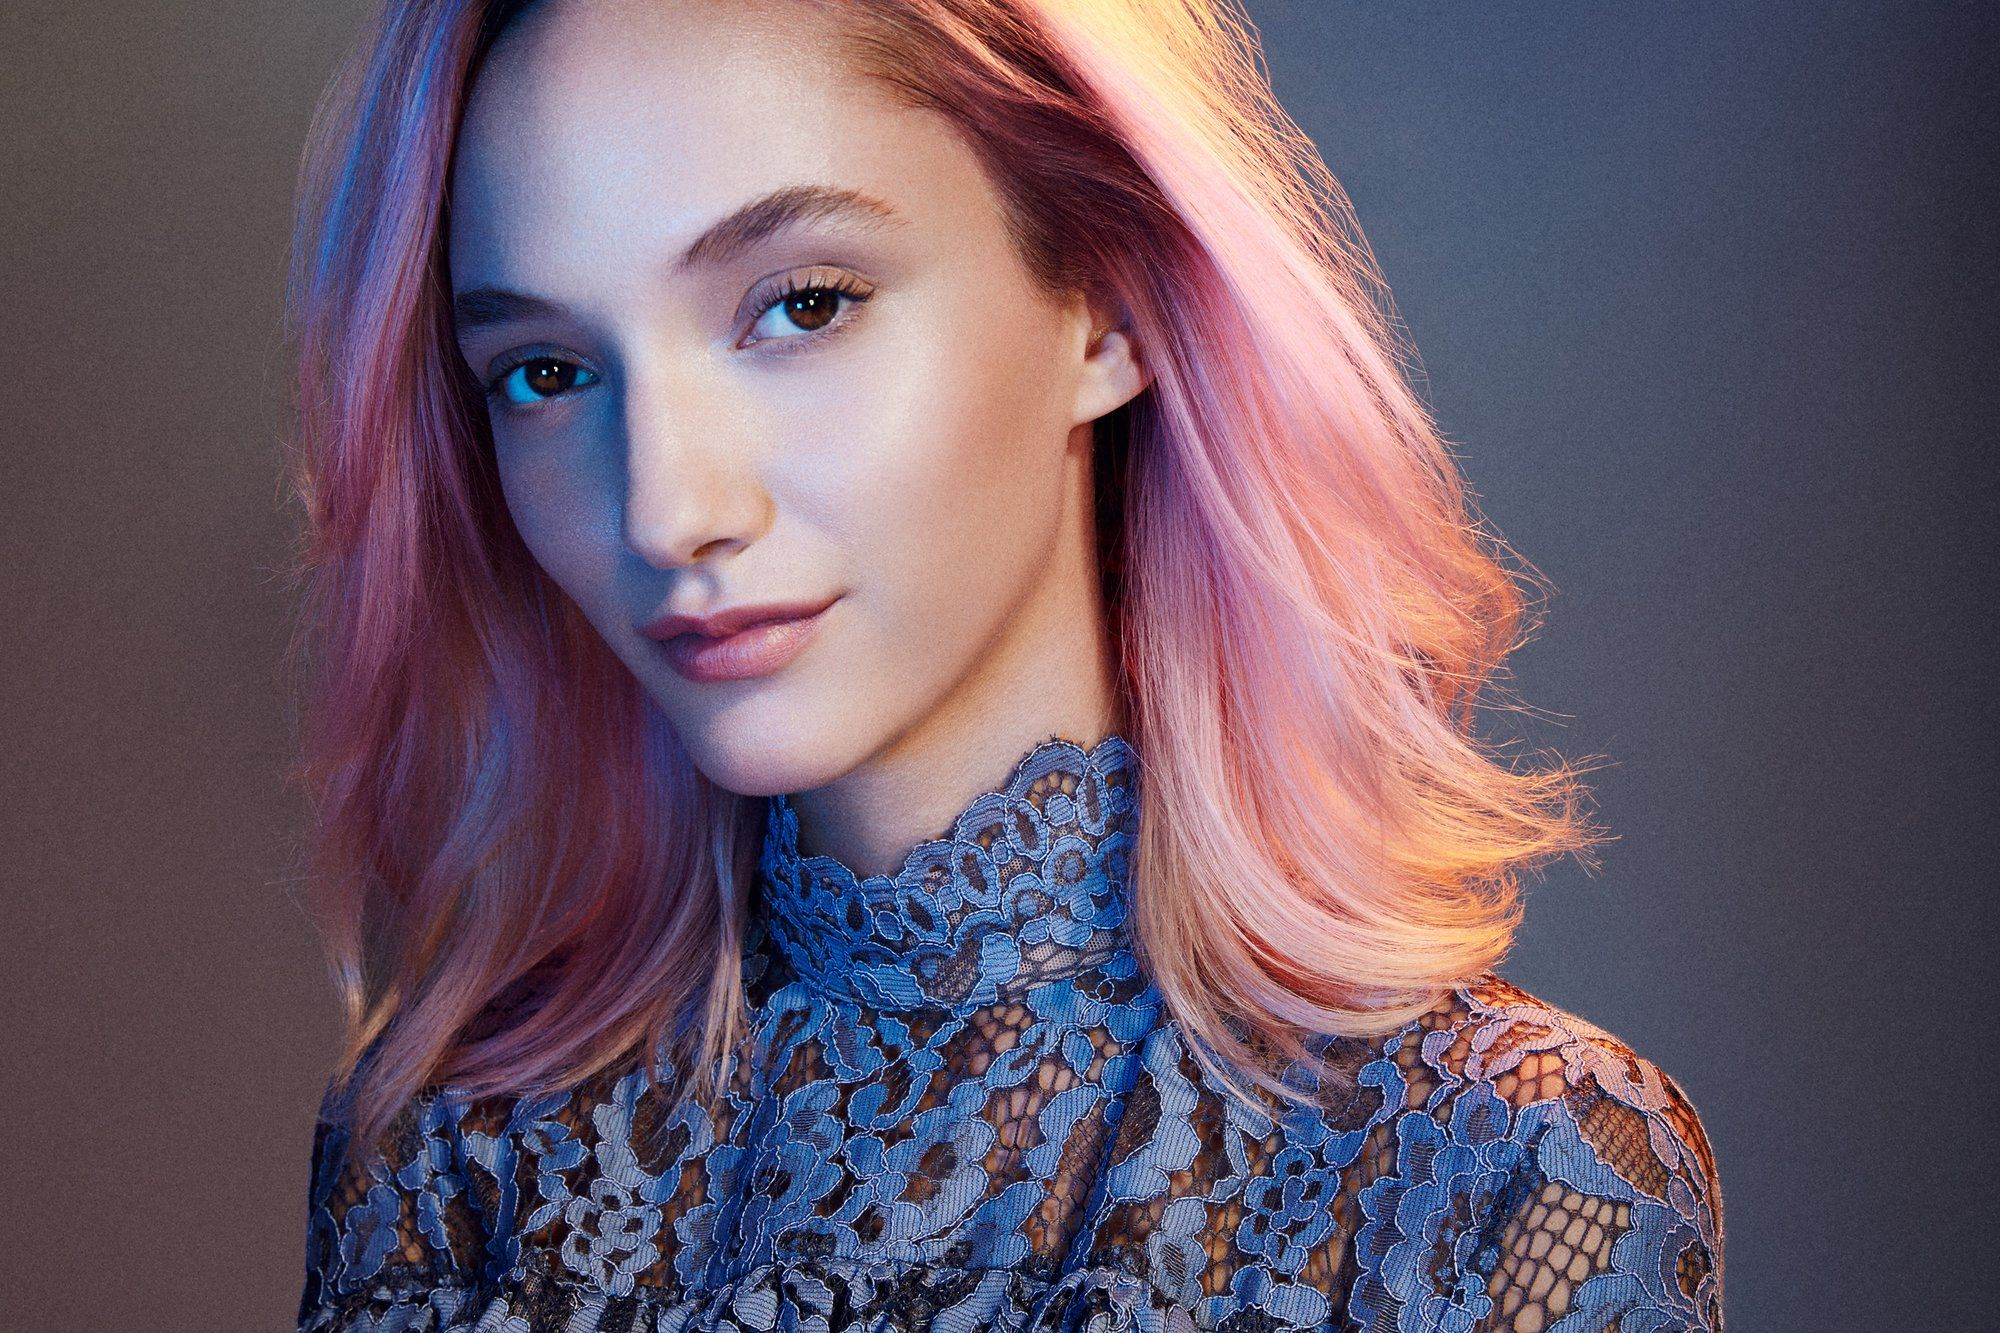 Dip-dyed pastel-pink ends look great on blonde hair, says hair colorist Aura Friedman.